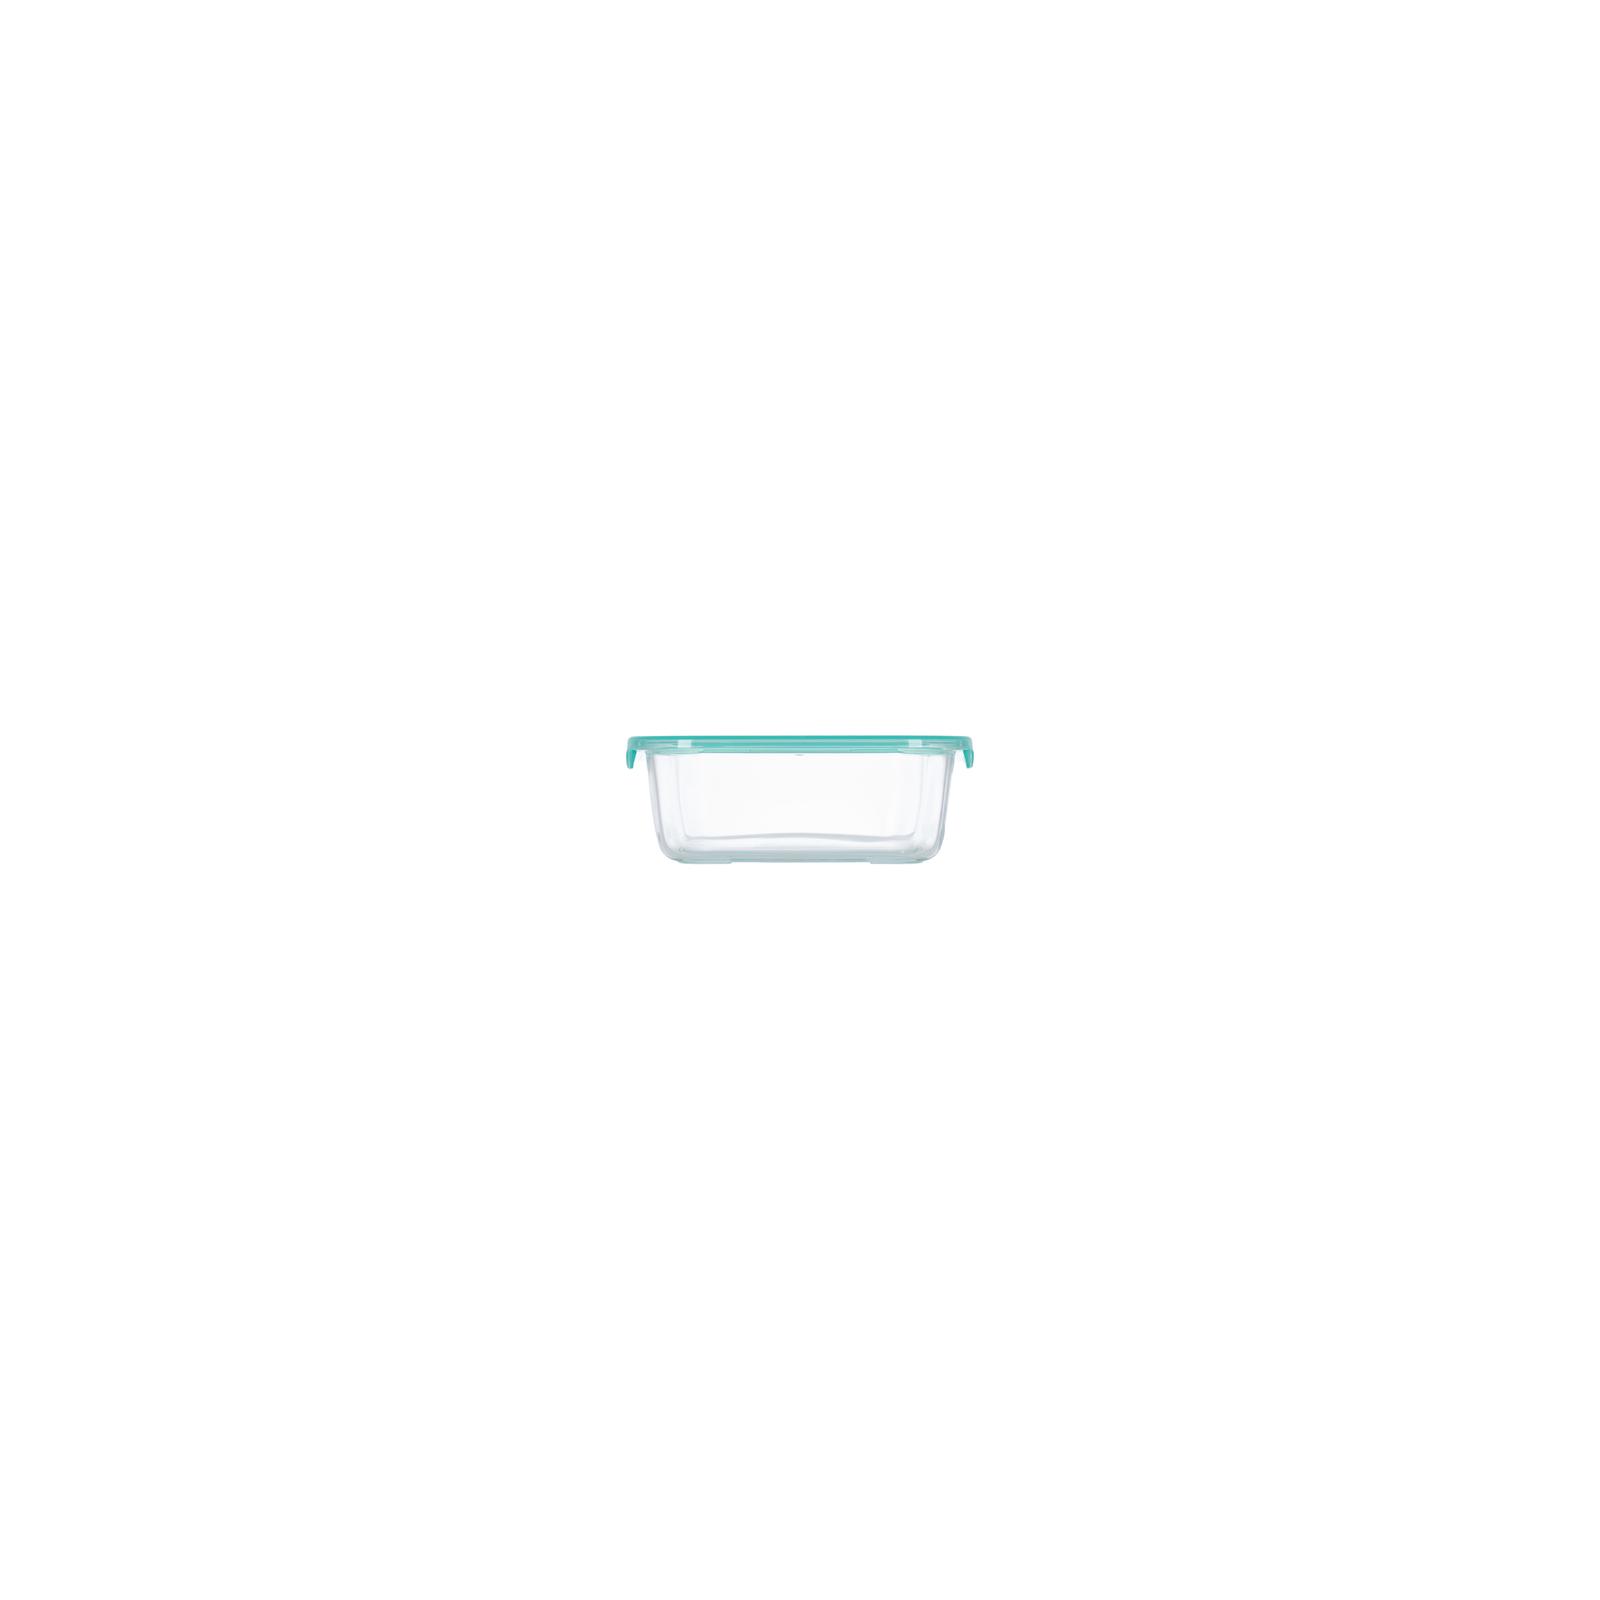 Пищевой контейнер Luminarc Keep'n Box Lagoon квадр. 1220 мл (P5520) изображение 2